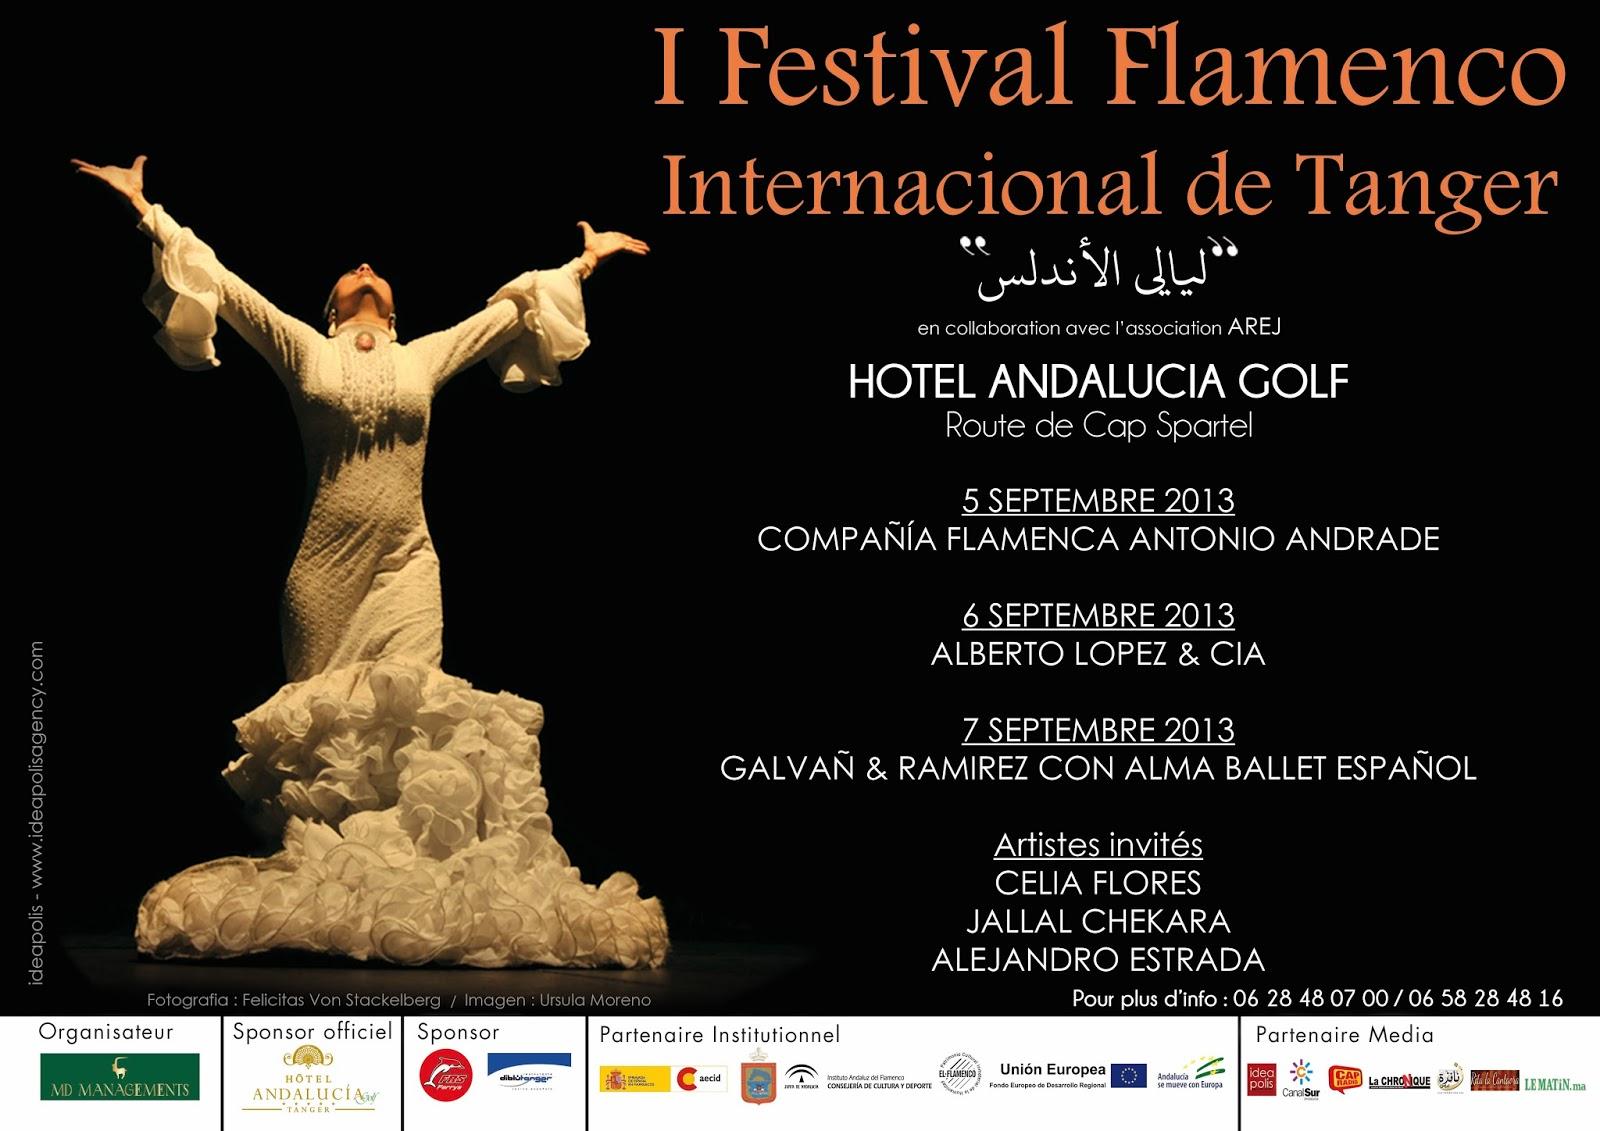 Festival Flamenco Internacional de Tanger